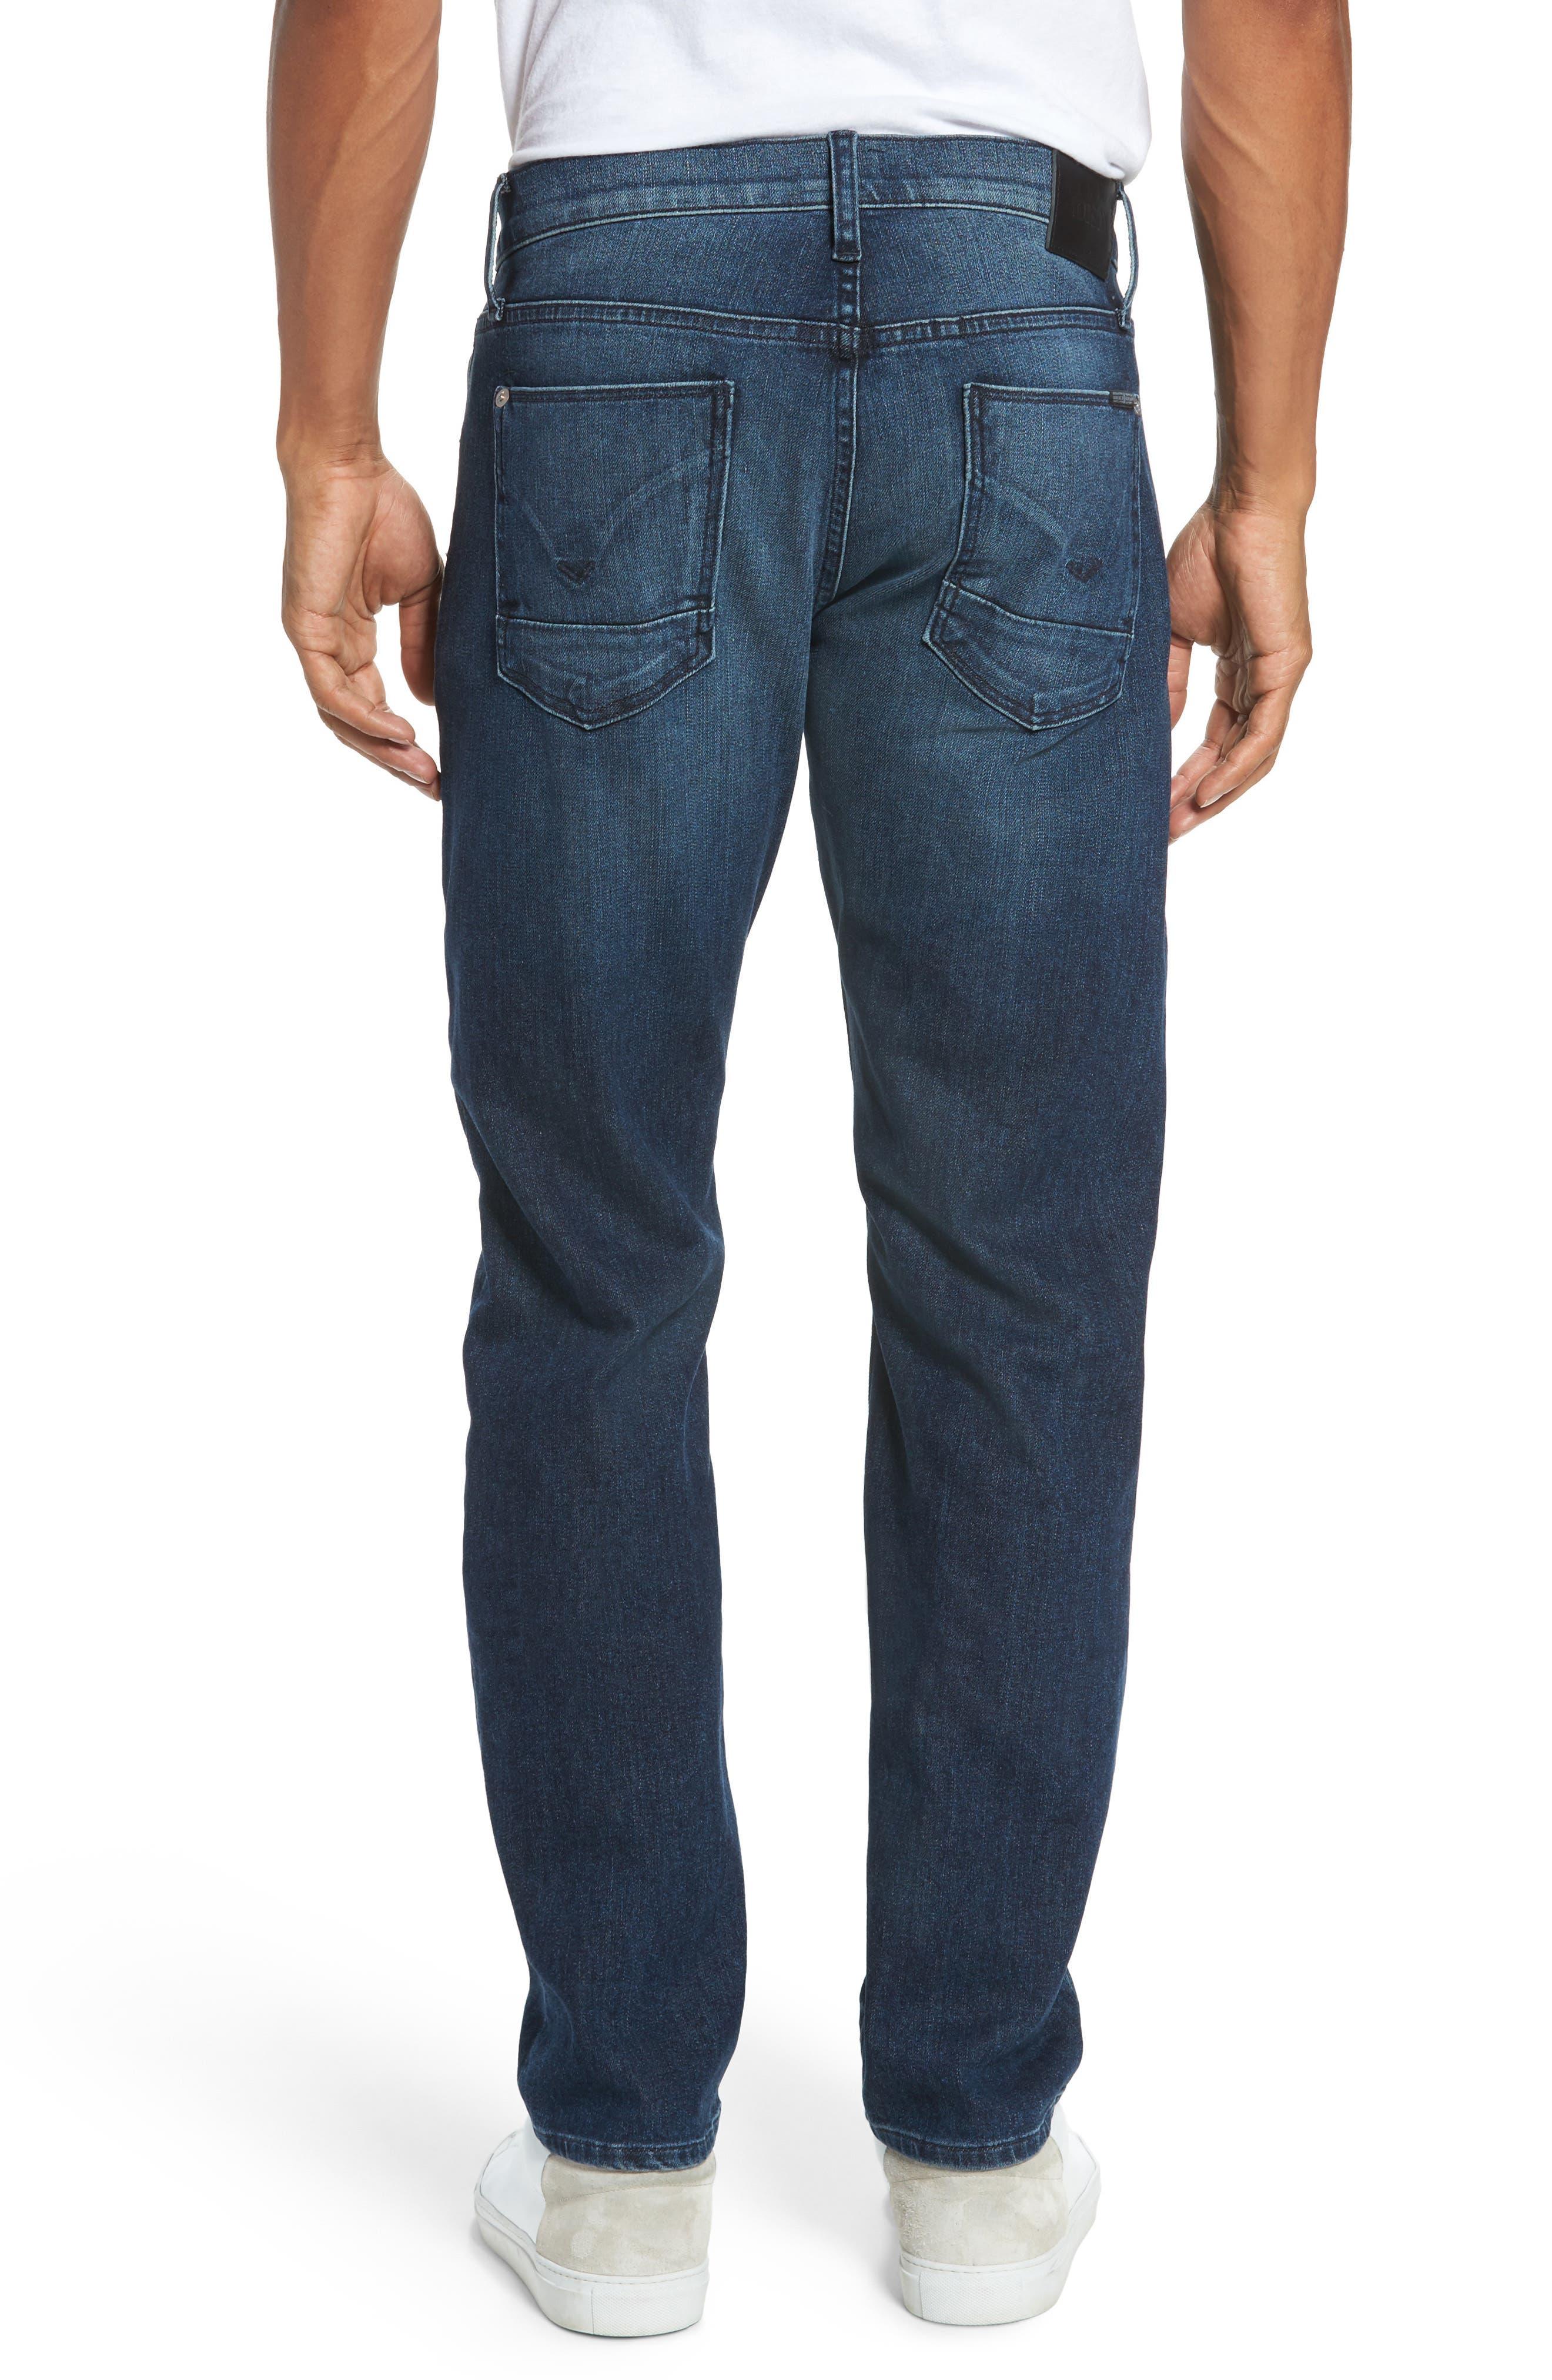 Blake Slim Fit Jeans,                             Alternate thumbnail 2, color,                             Regret